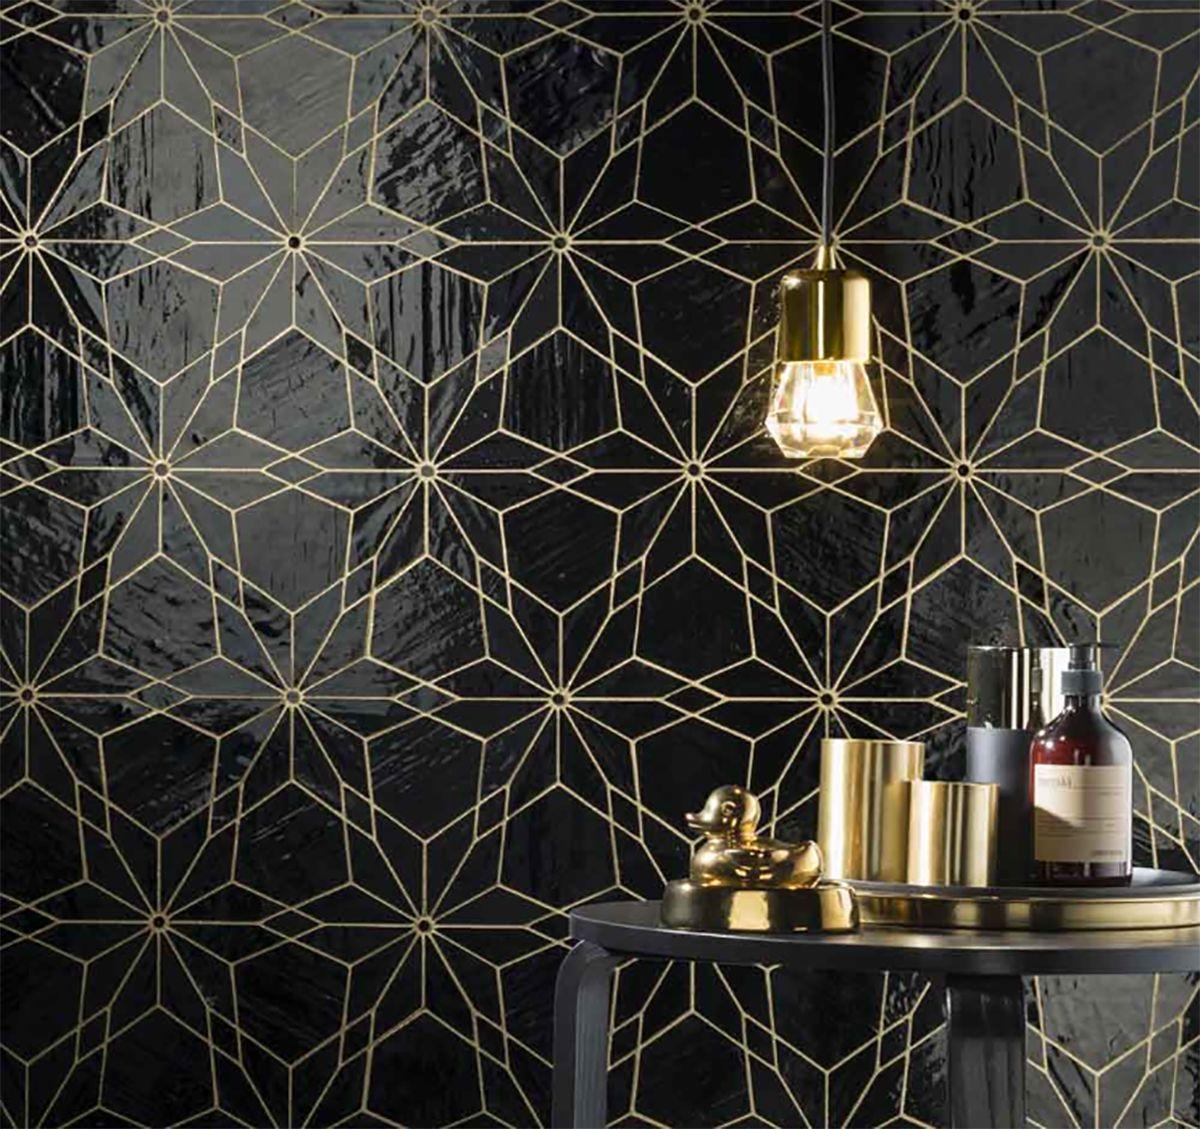 Diamond Neropuro Midamericatile Lovetile Blackwhite Blacktile Lovetile Design Tileideas Get Black And Gold Bathroom Black Mosaic Tile Black Bathroom